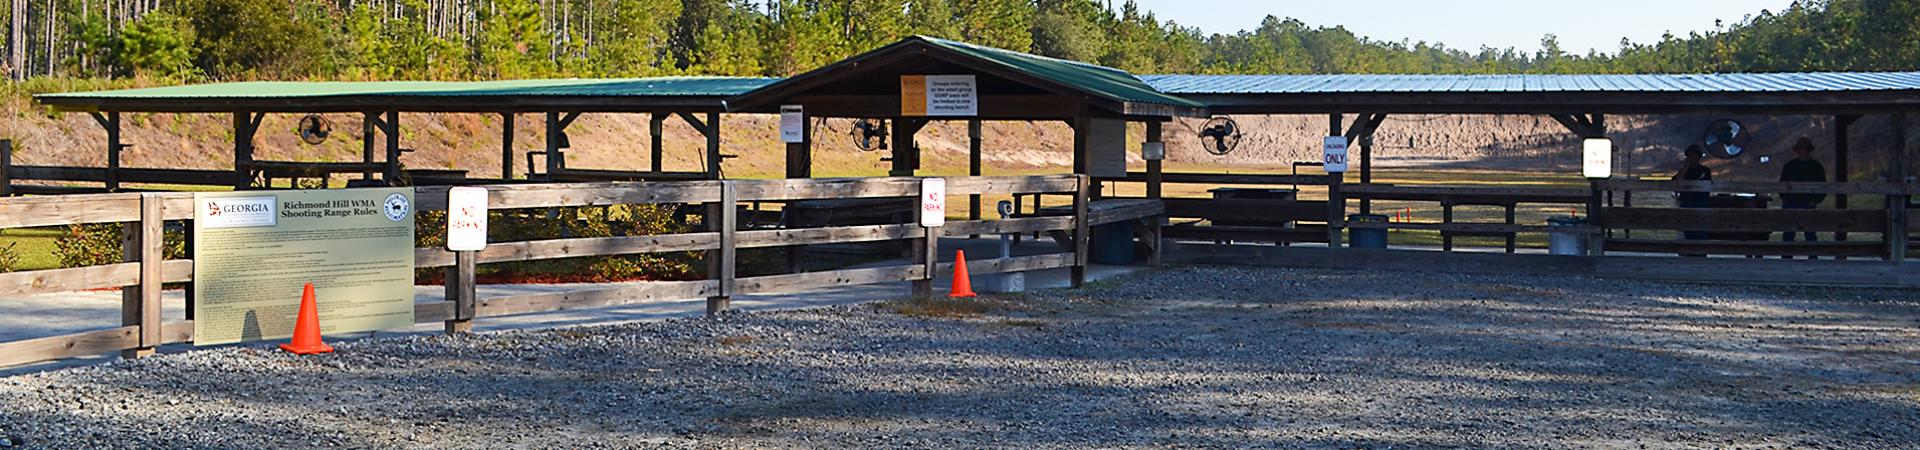 Shooting Range at Richmond Hill